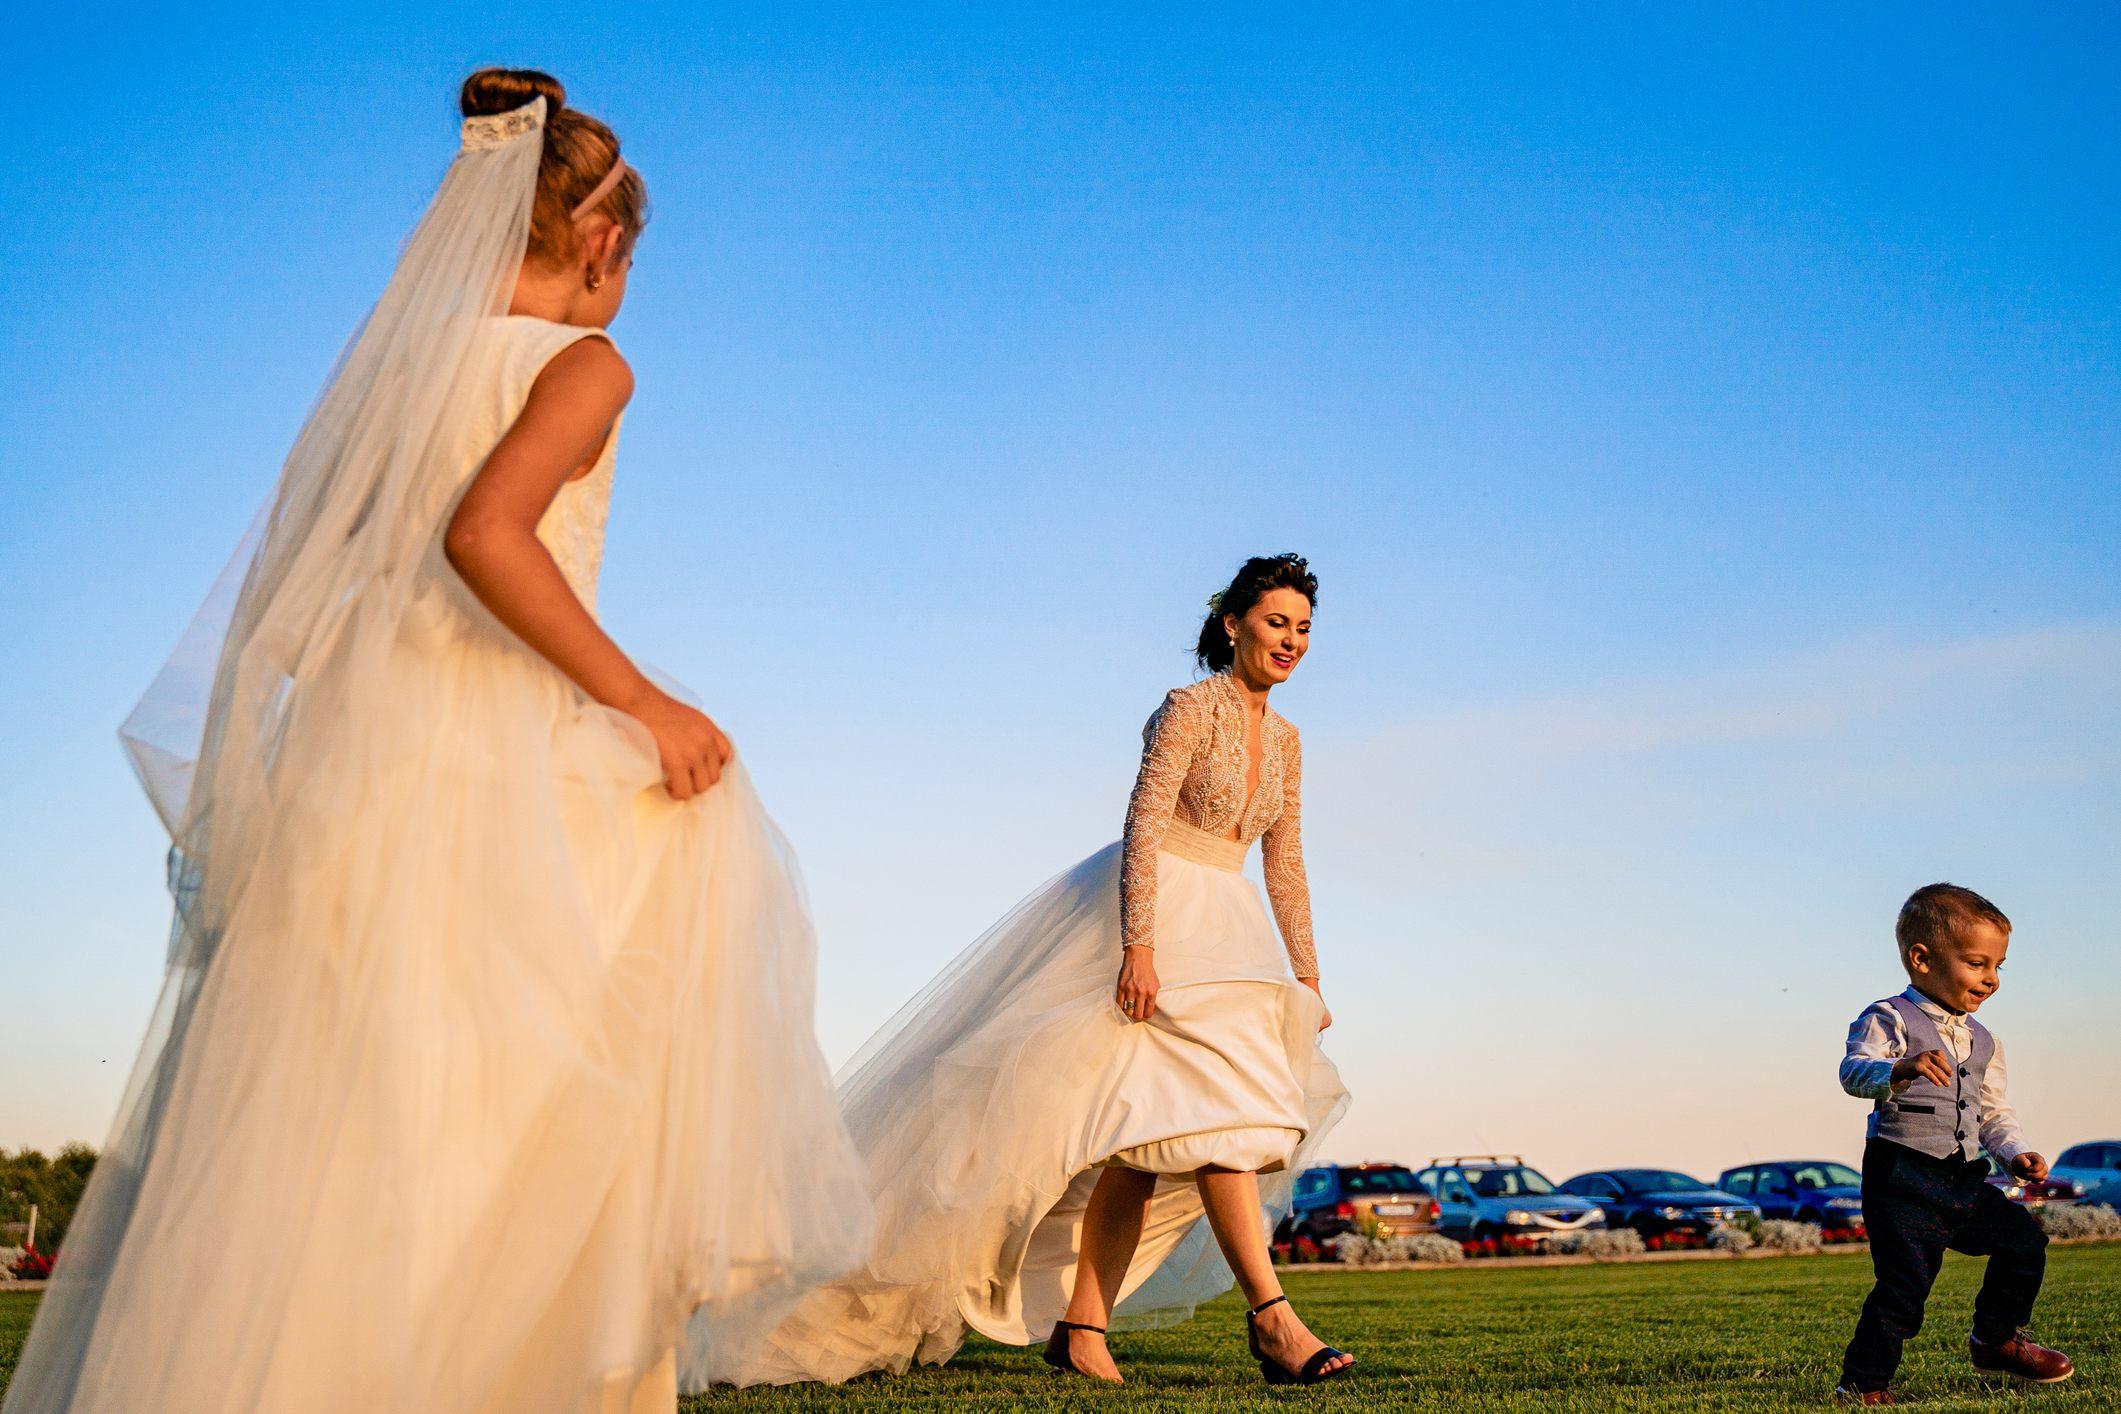 fotograf nunta bucuresti laurentiu nica  18 - Lorena & Matei | Fotografii nunta Bucuresti | Restaurant Domeniul cu Ciresi